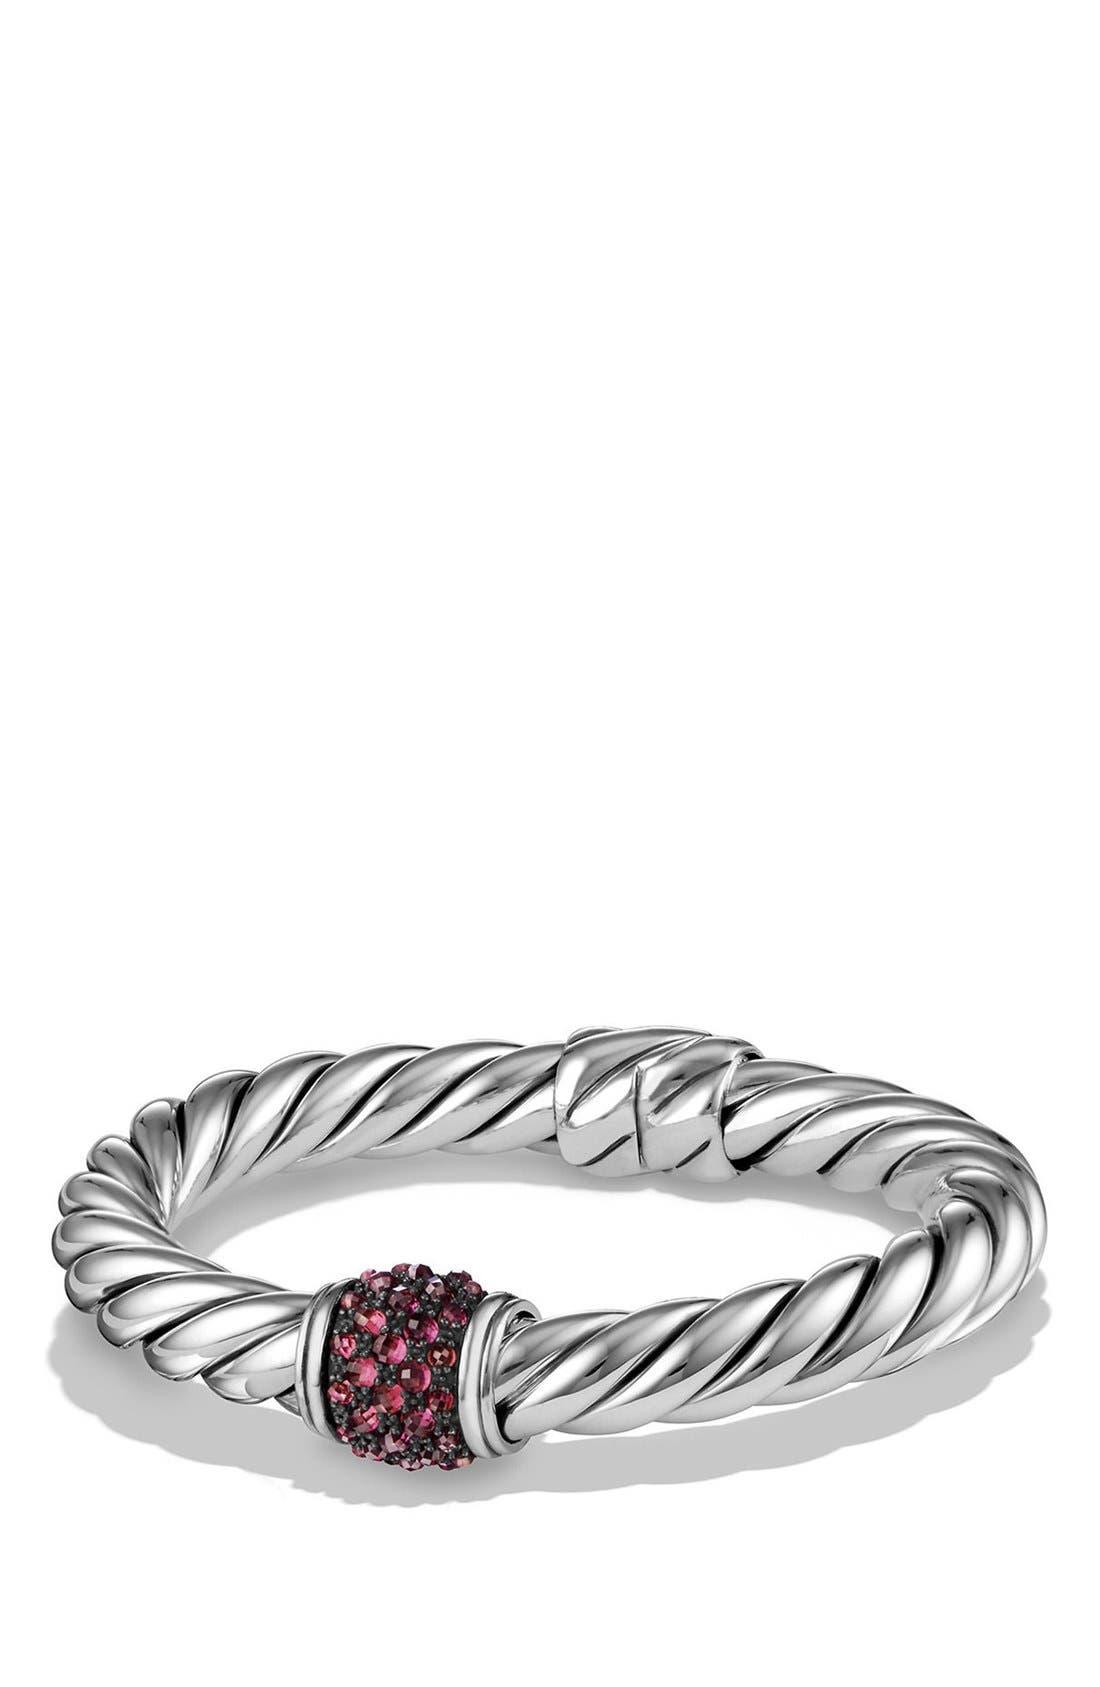 Osetra Hinge Bracelet,                         Main,                         color, Silver